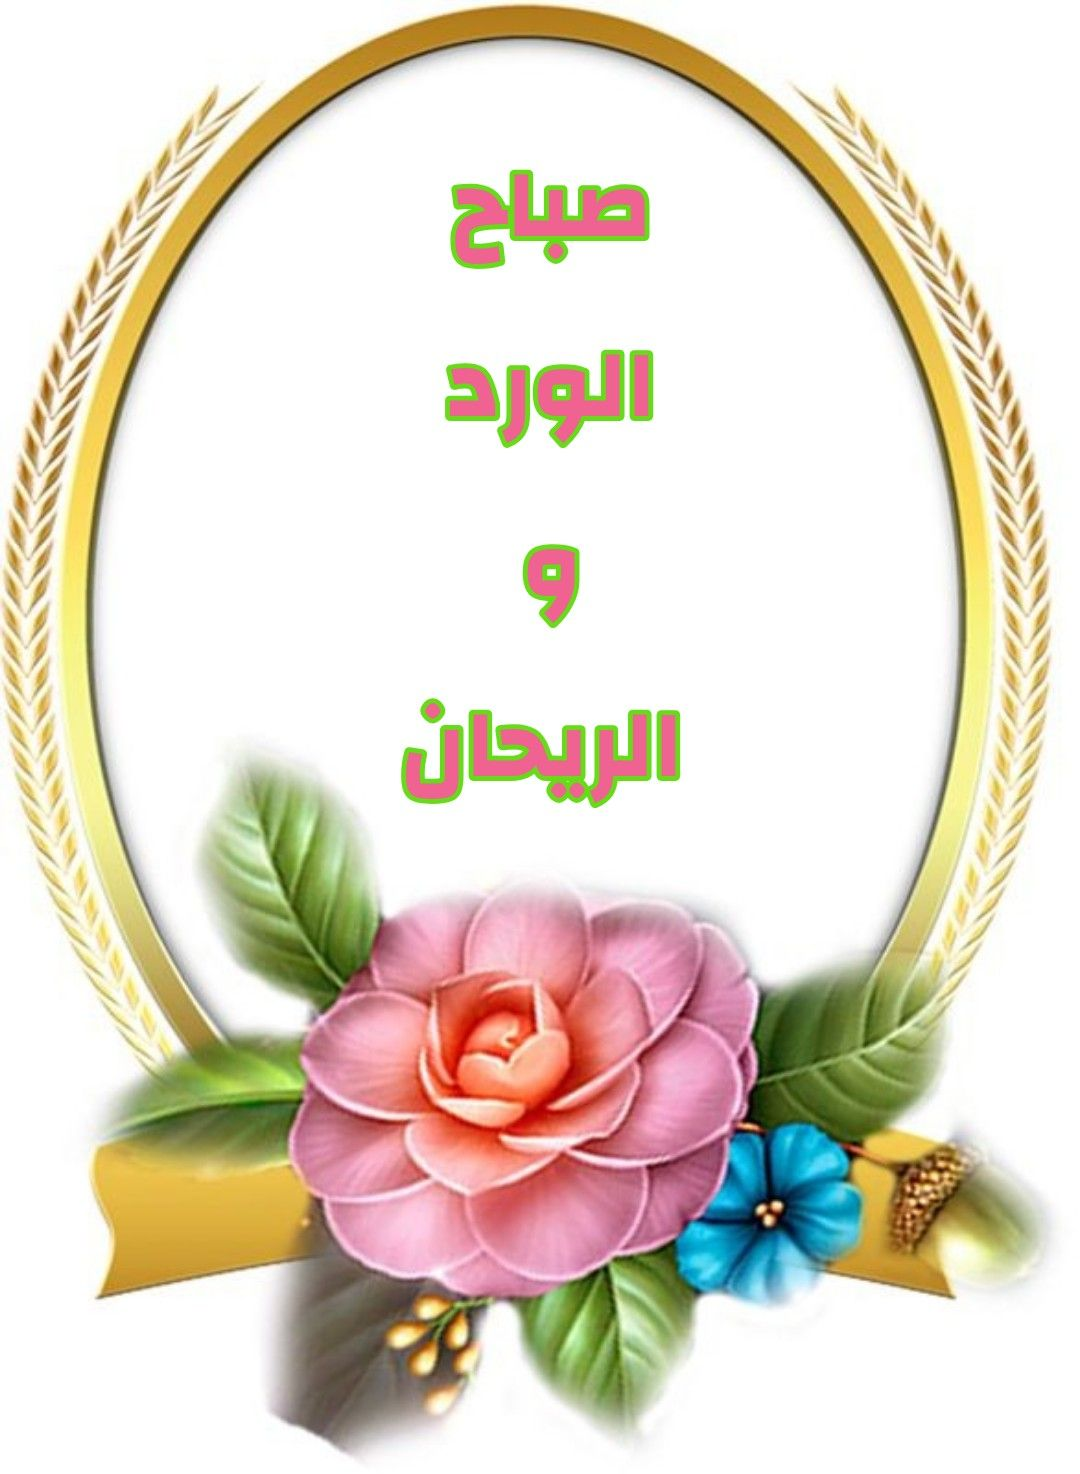 Pin By Mukhtar El Sawadi On صباح الخير صباح الورد Good Morning Messages Morning Messages Greetings